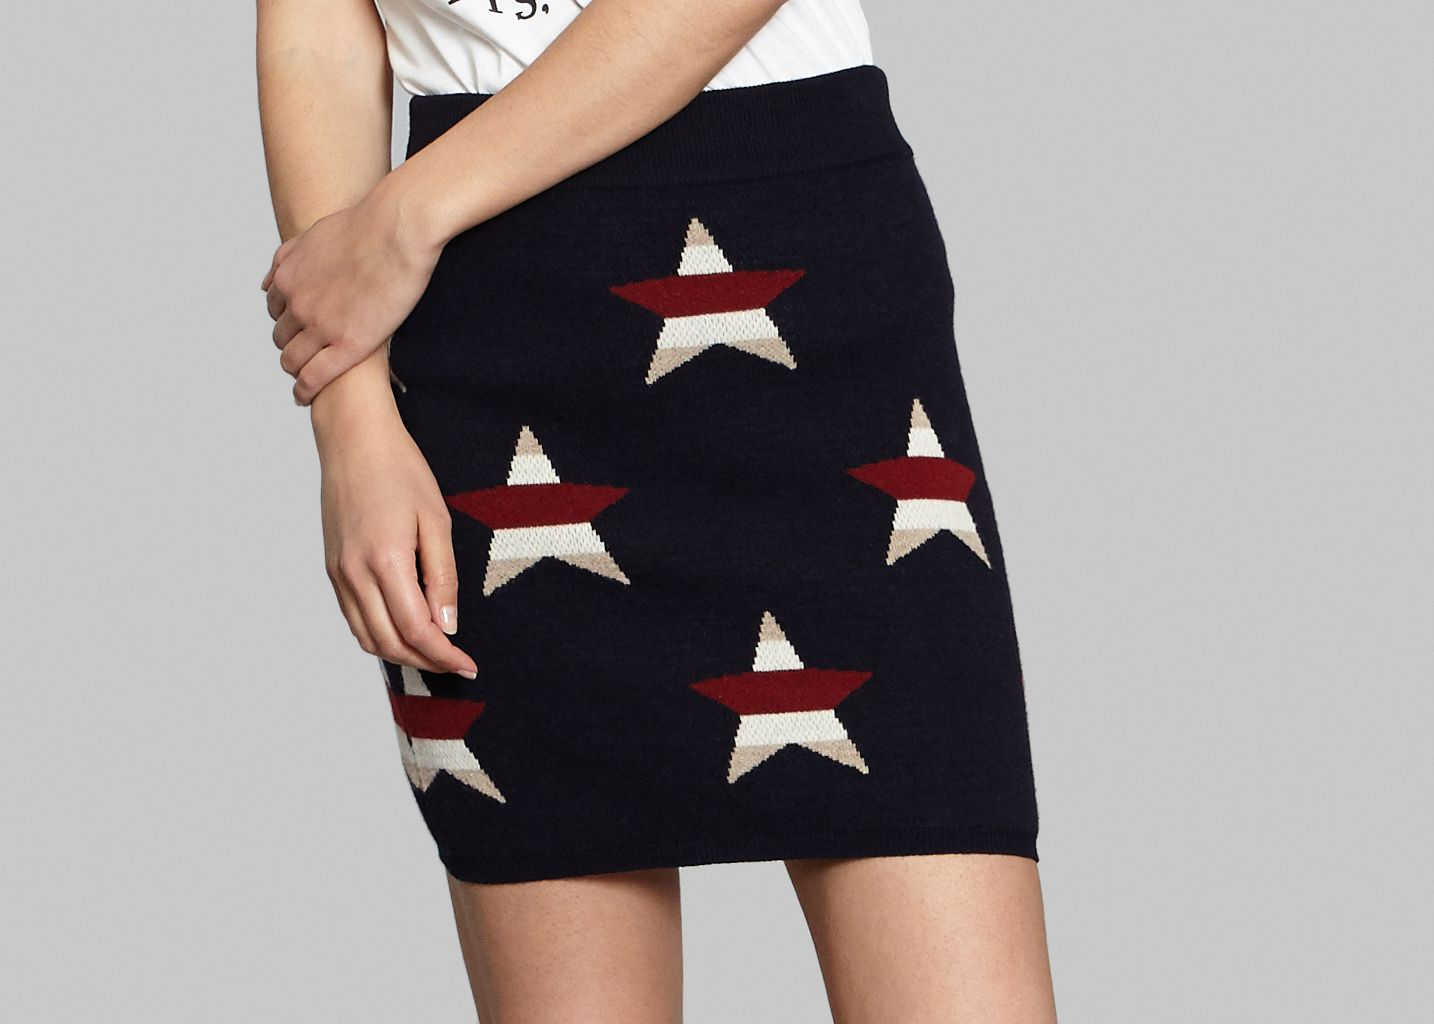 Stars Skirt - Maison Kitsuné